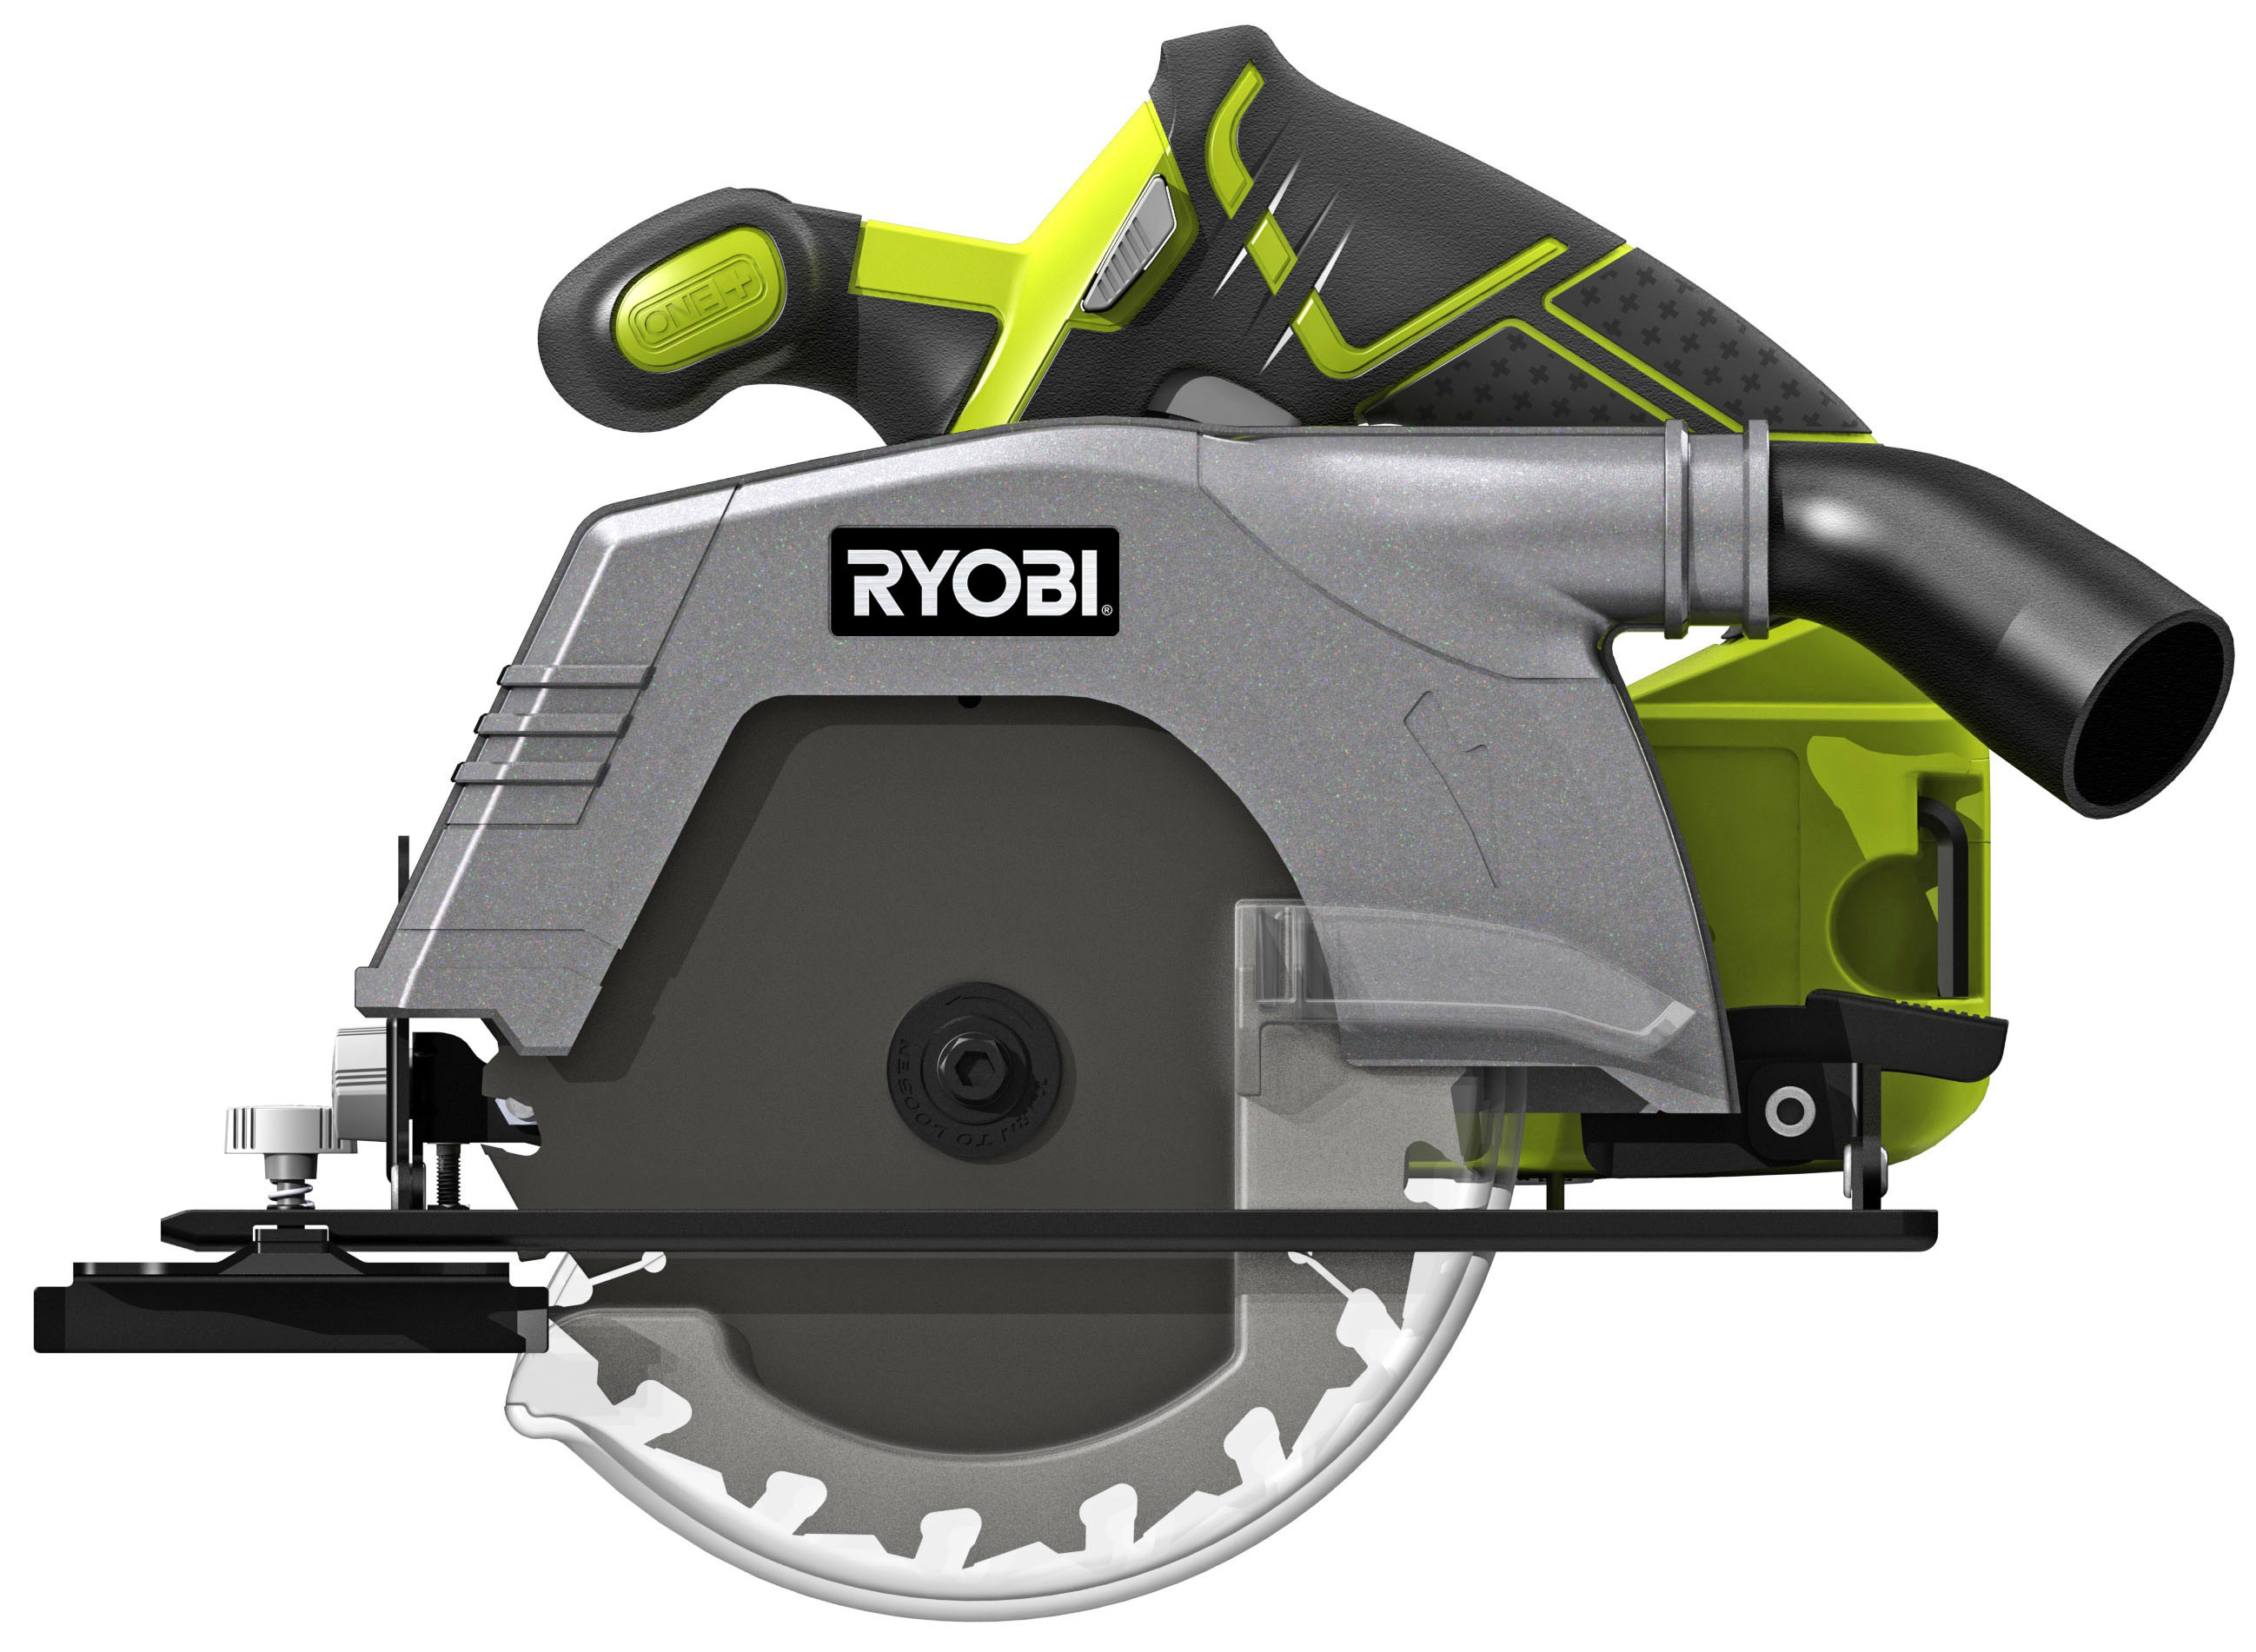 Scie circulaire sans fil RYOBI One+ R18CS-0, 0 batterie